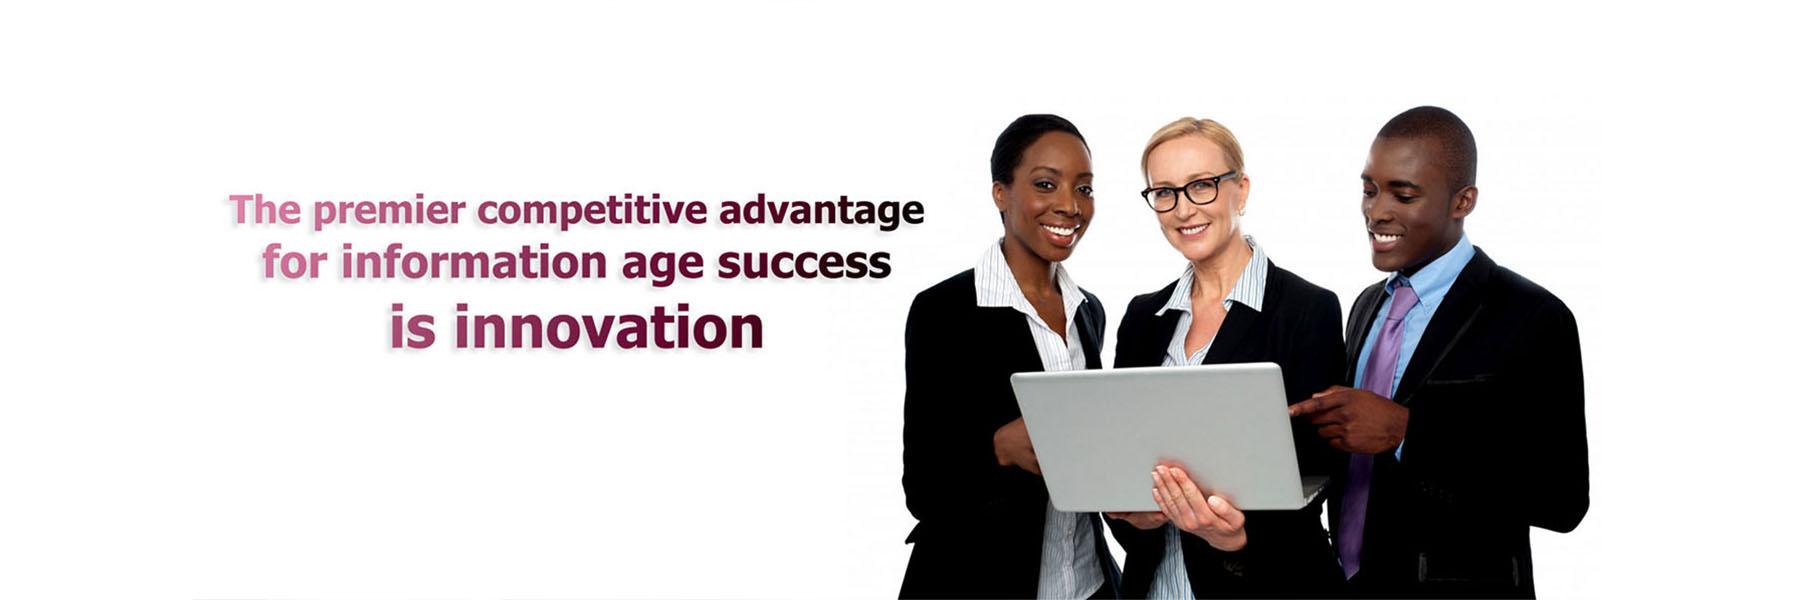 slide-4-3×1-executive-diversity-training-slider-images